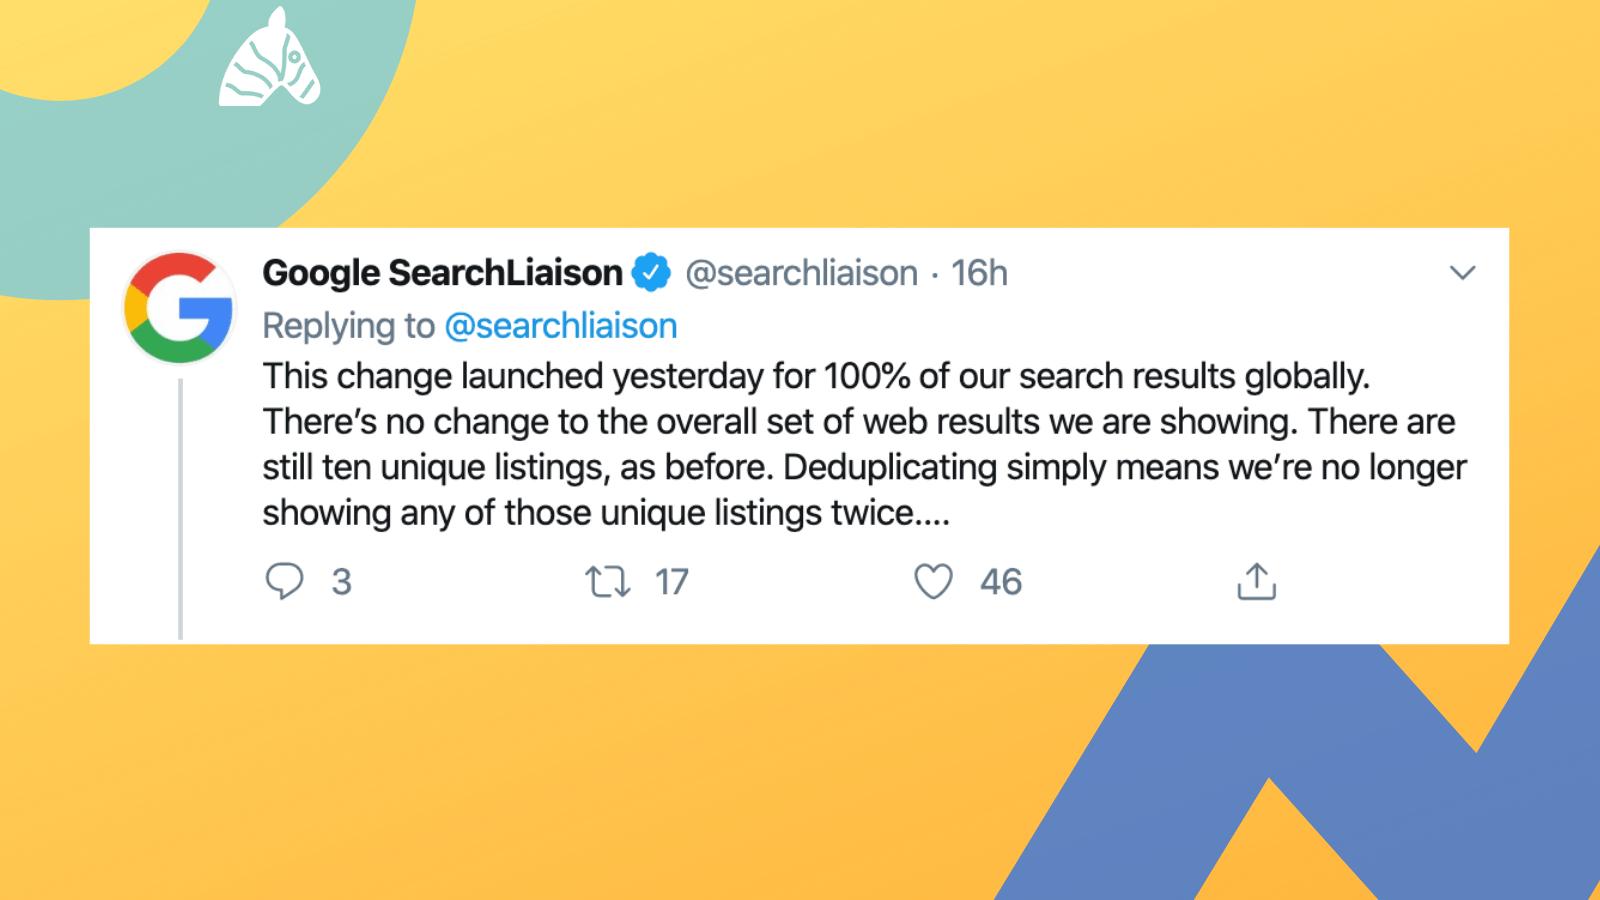 search liason tweet about Google update